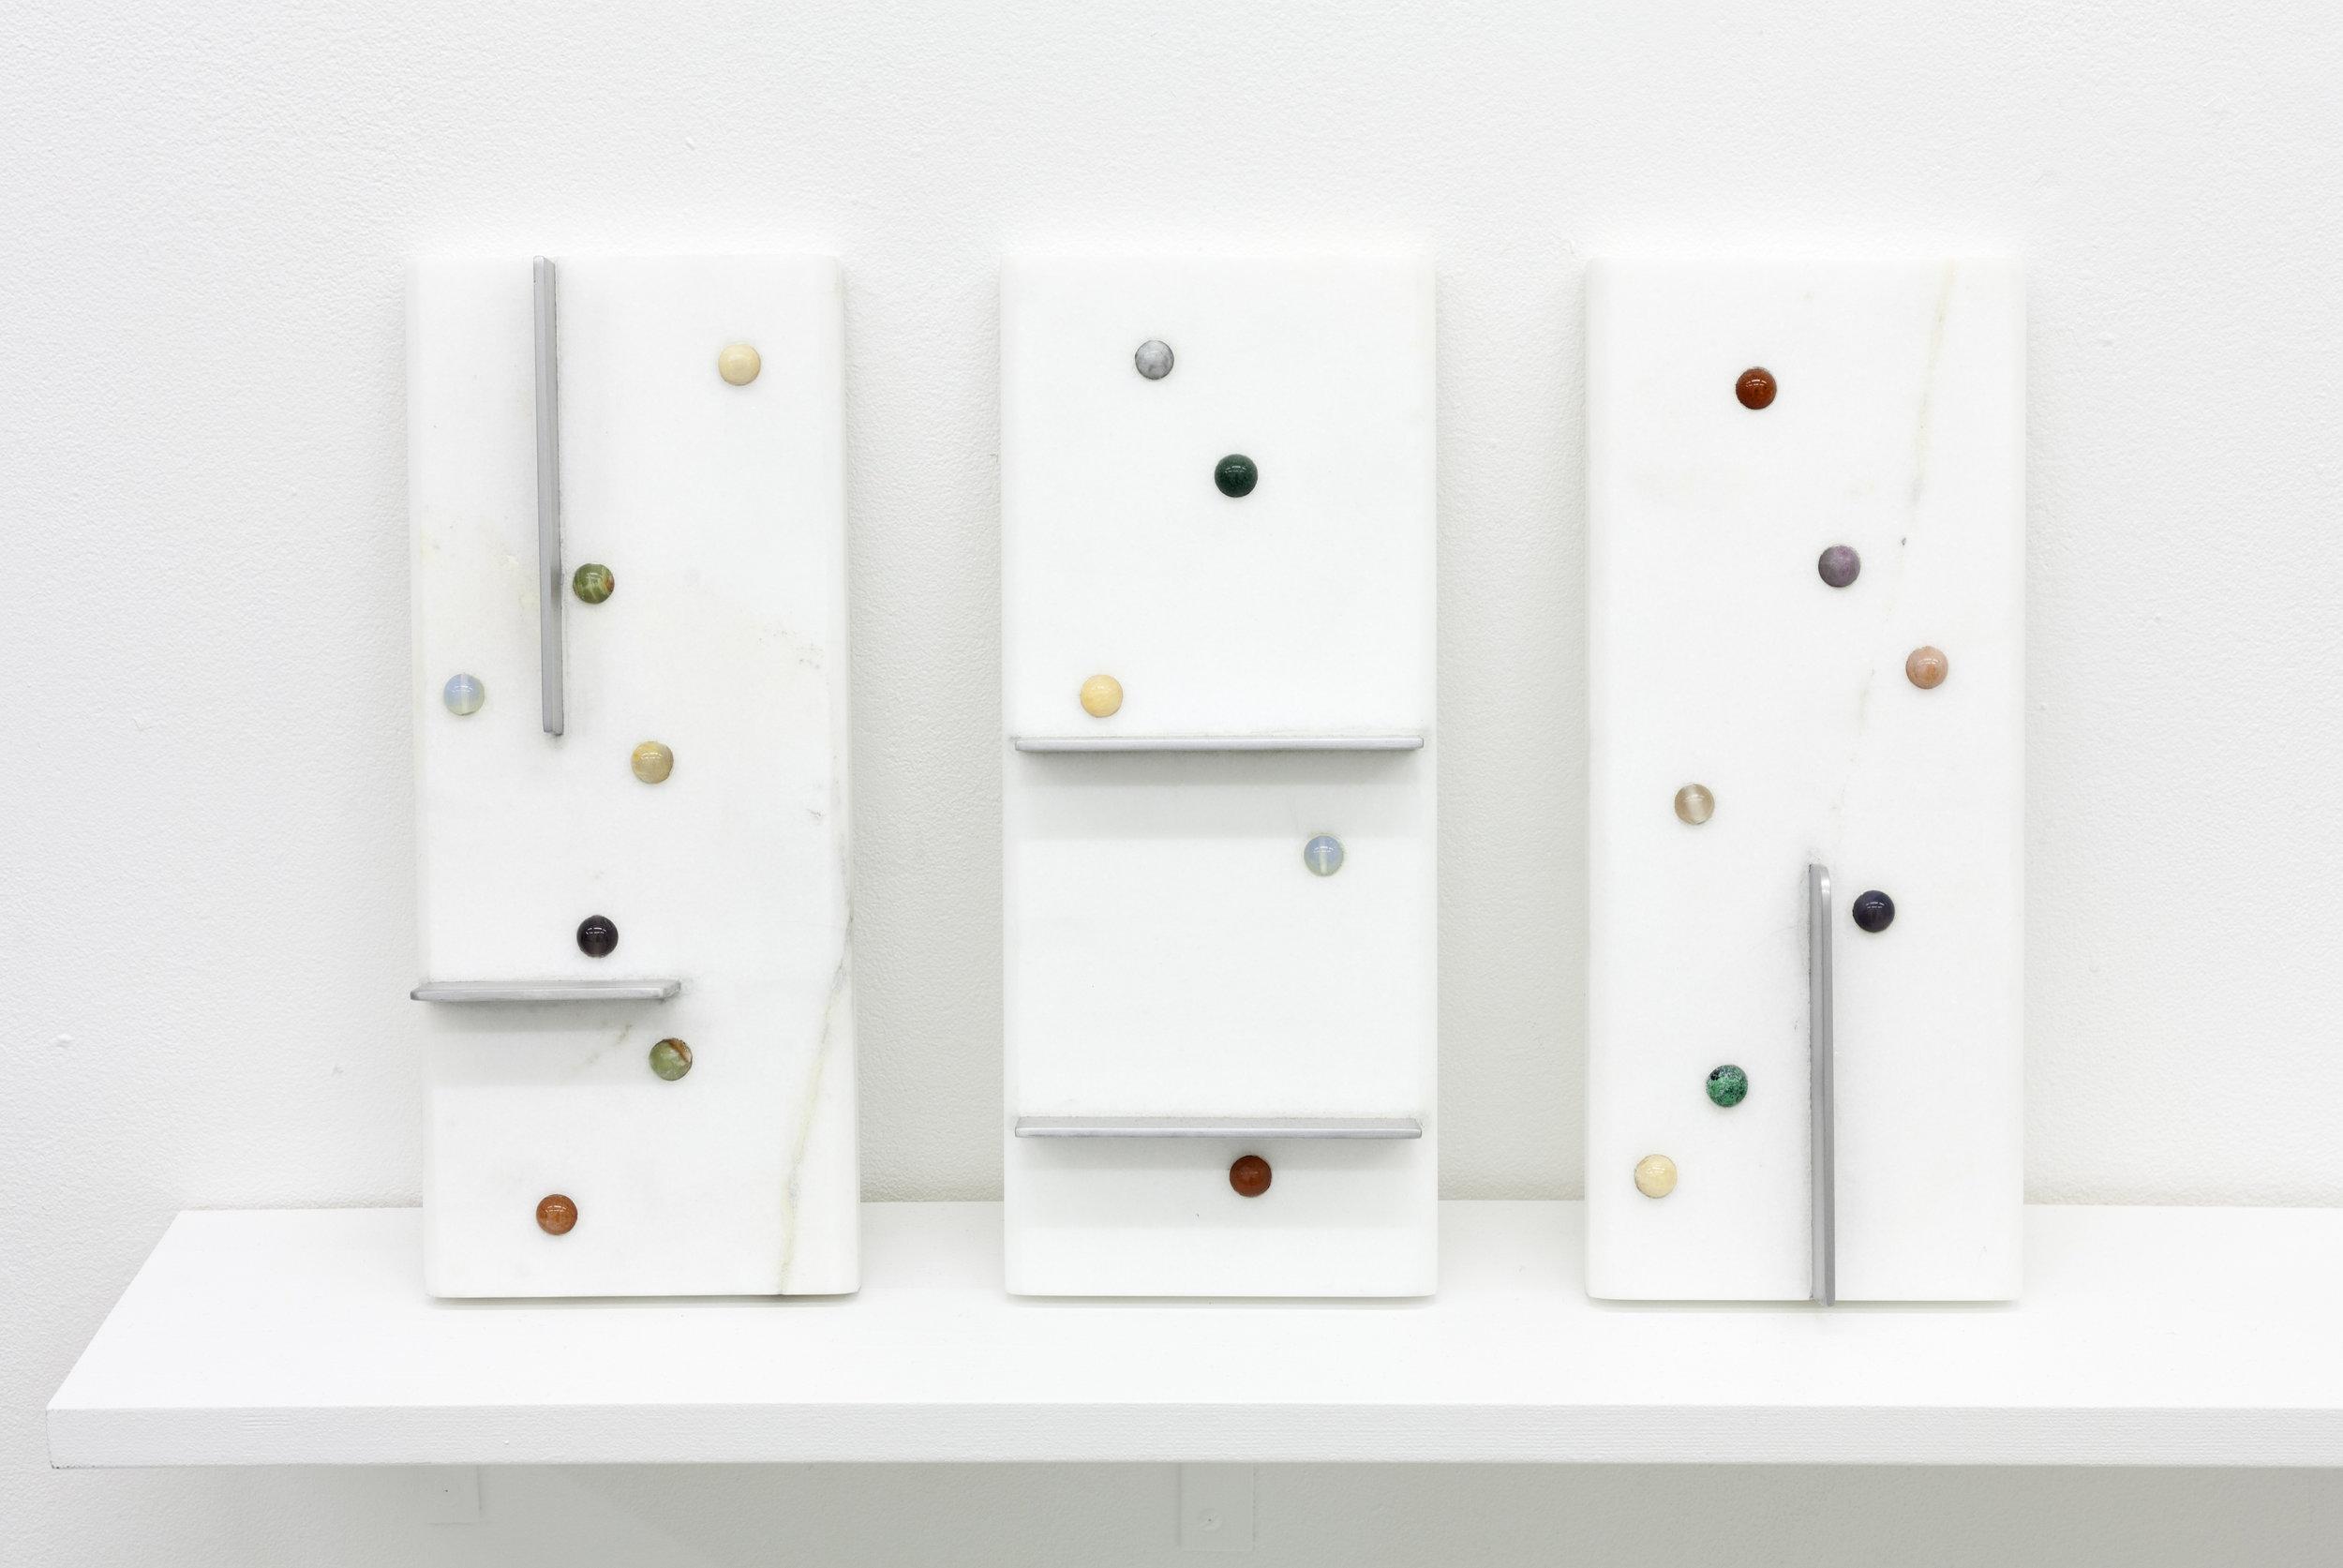 """Marble Run Tablet"" (1, 2, 3)  5"" x 12"" x .75"" White Carrara marble, glass beads, marble, aluminum 2018"